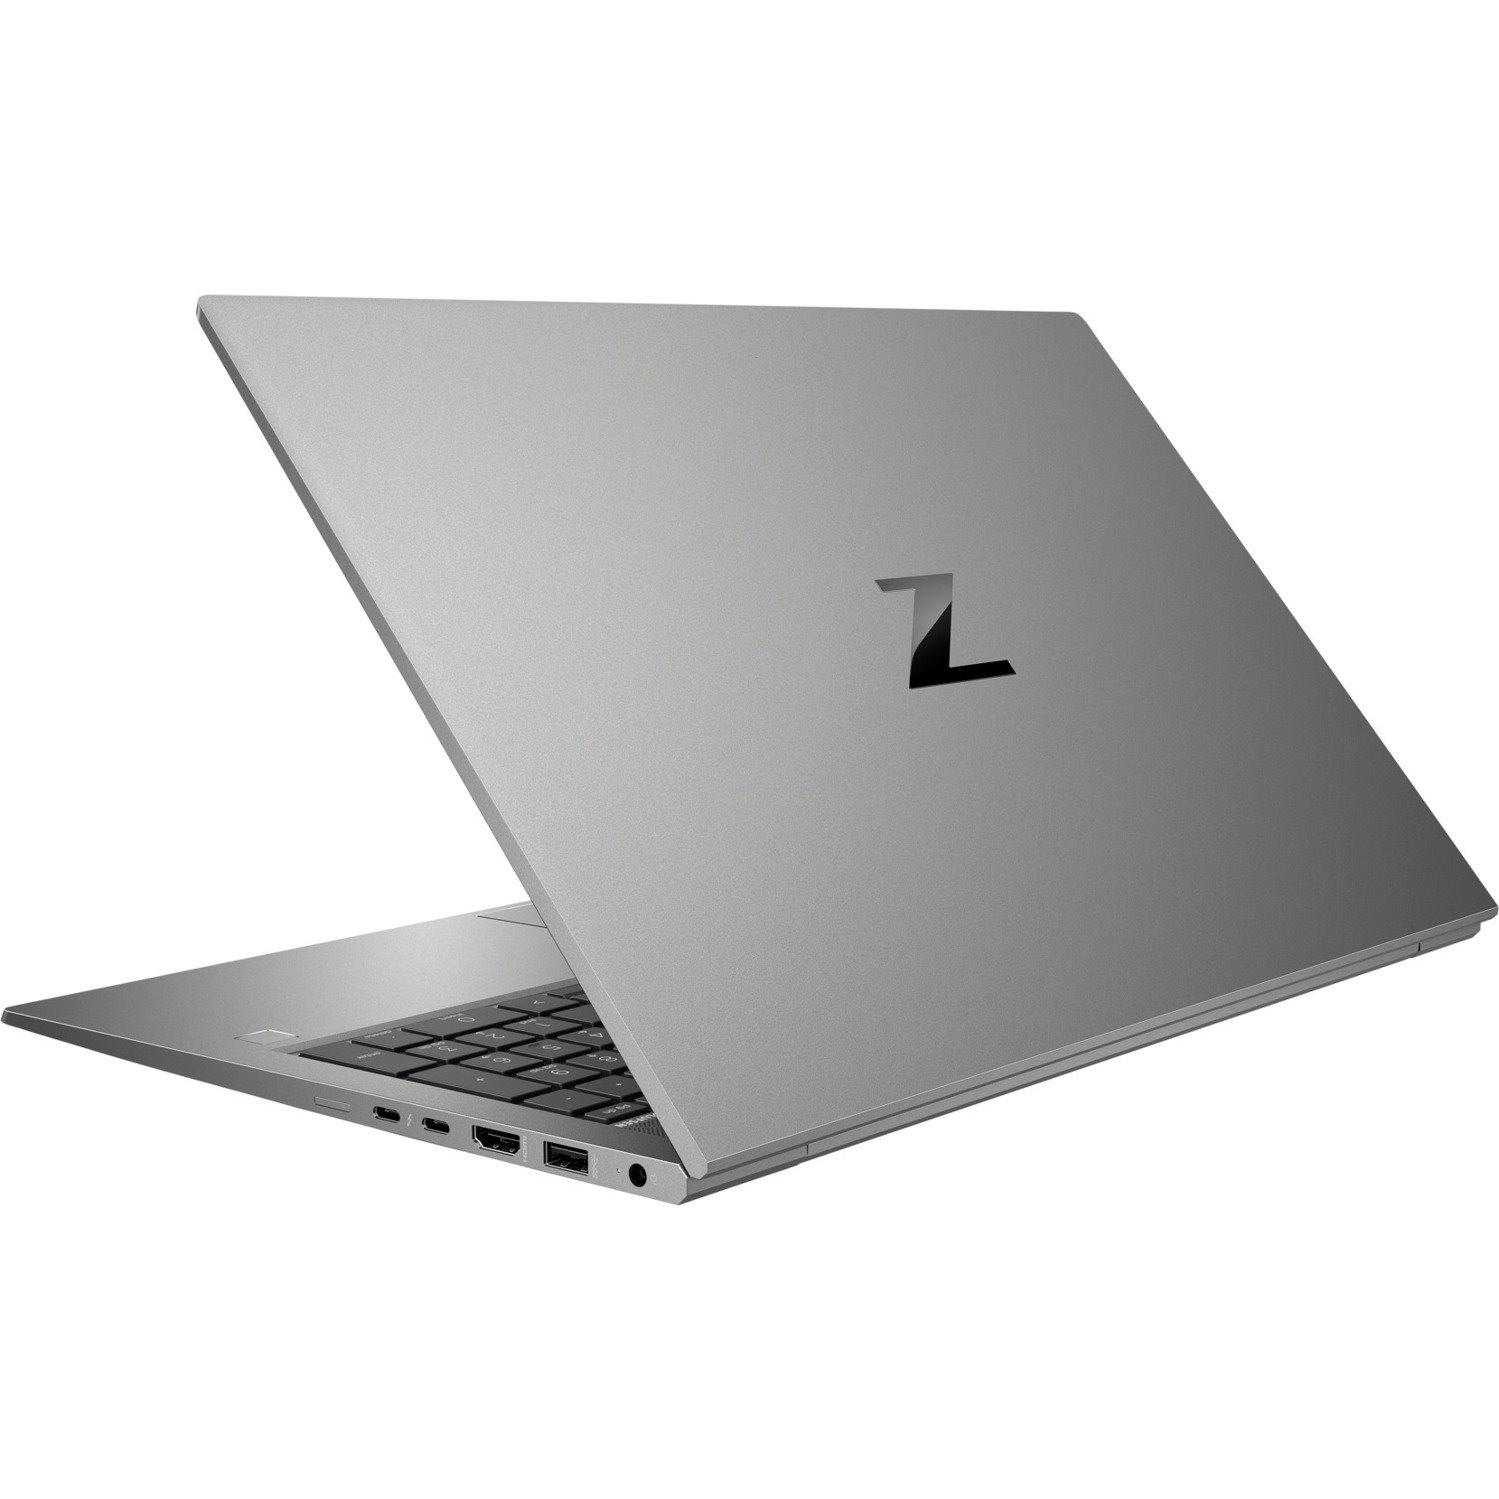 "HP ZBook Firefly 15 G8 39.6 cm (15.6"") Mobile Workstation - Full HD - 1920 x 1080 - Intel Core i7 11th Gen i7-1165G7 Quad-core (4 Core) 2.80 GHz - 32 GB RAM - 512 GB SSD"